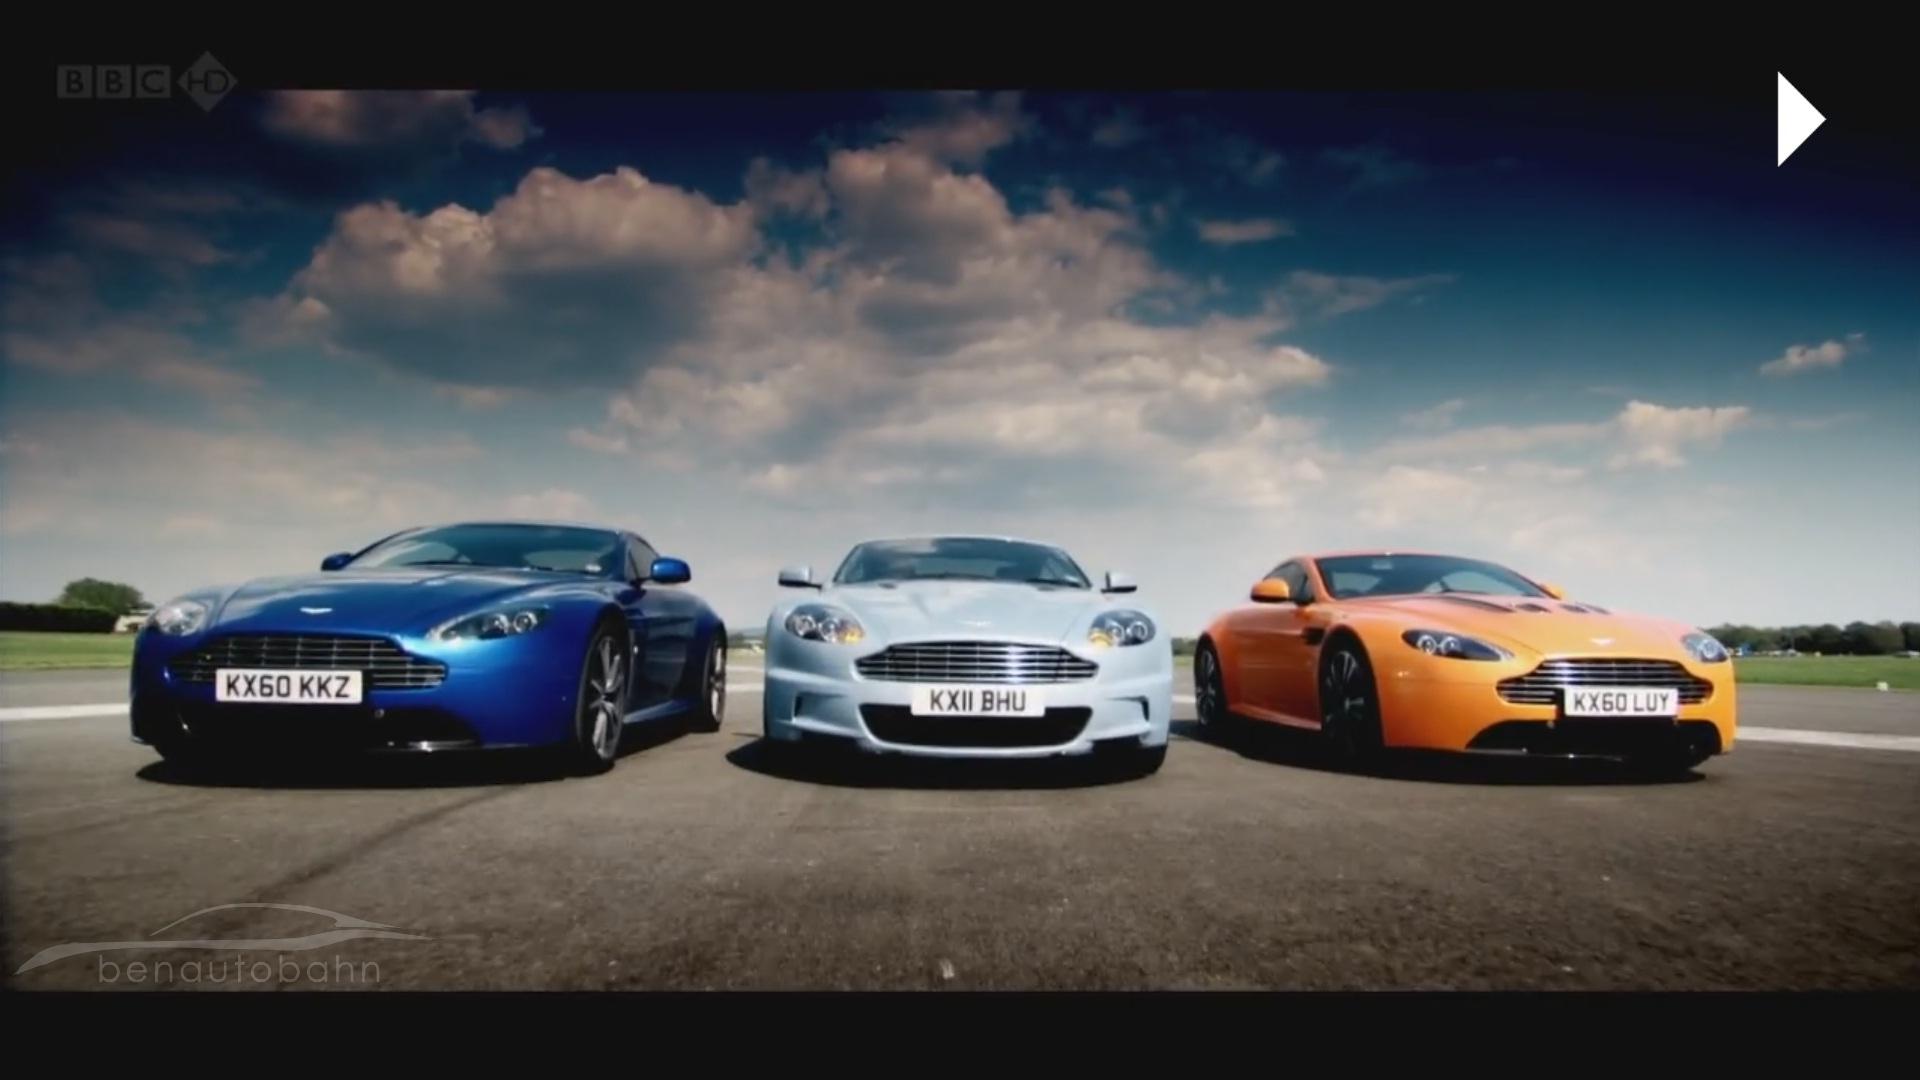 Fascinantan Oprema Bolan Top Gear Aston Martin Db9 Kennethweines Com